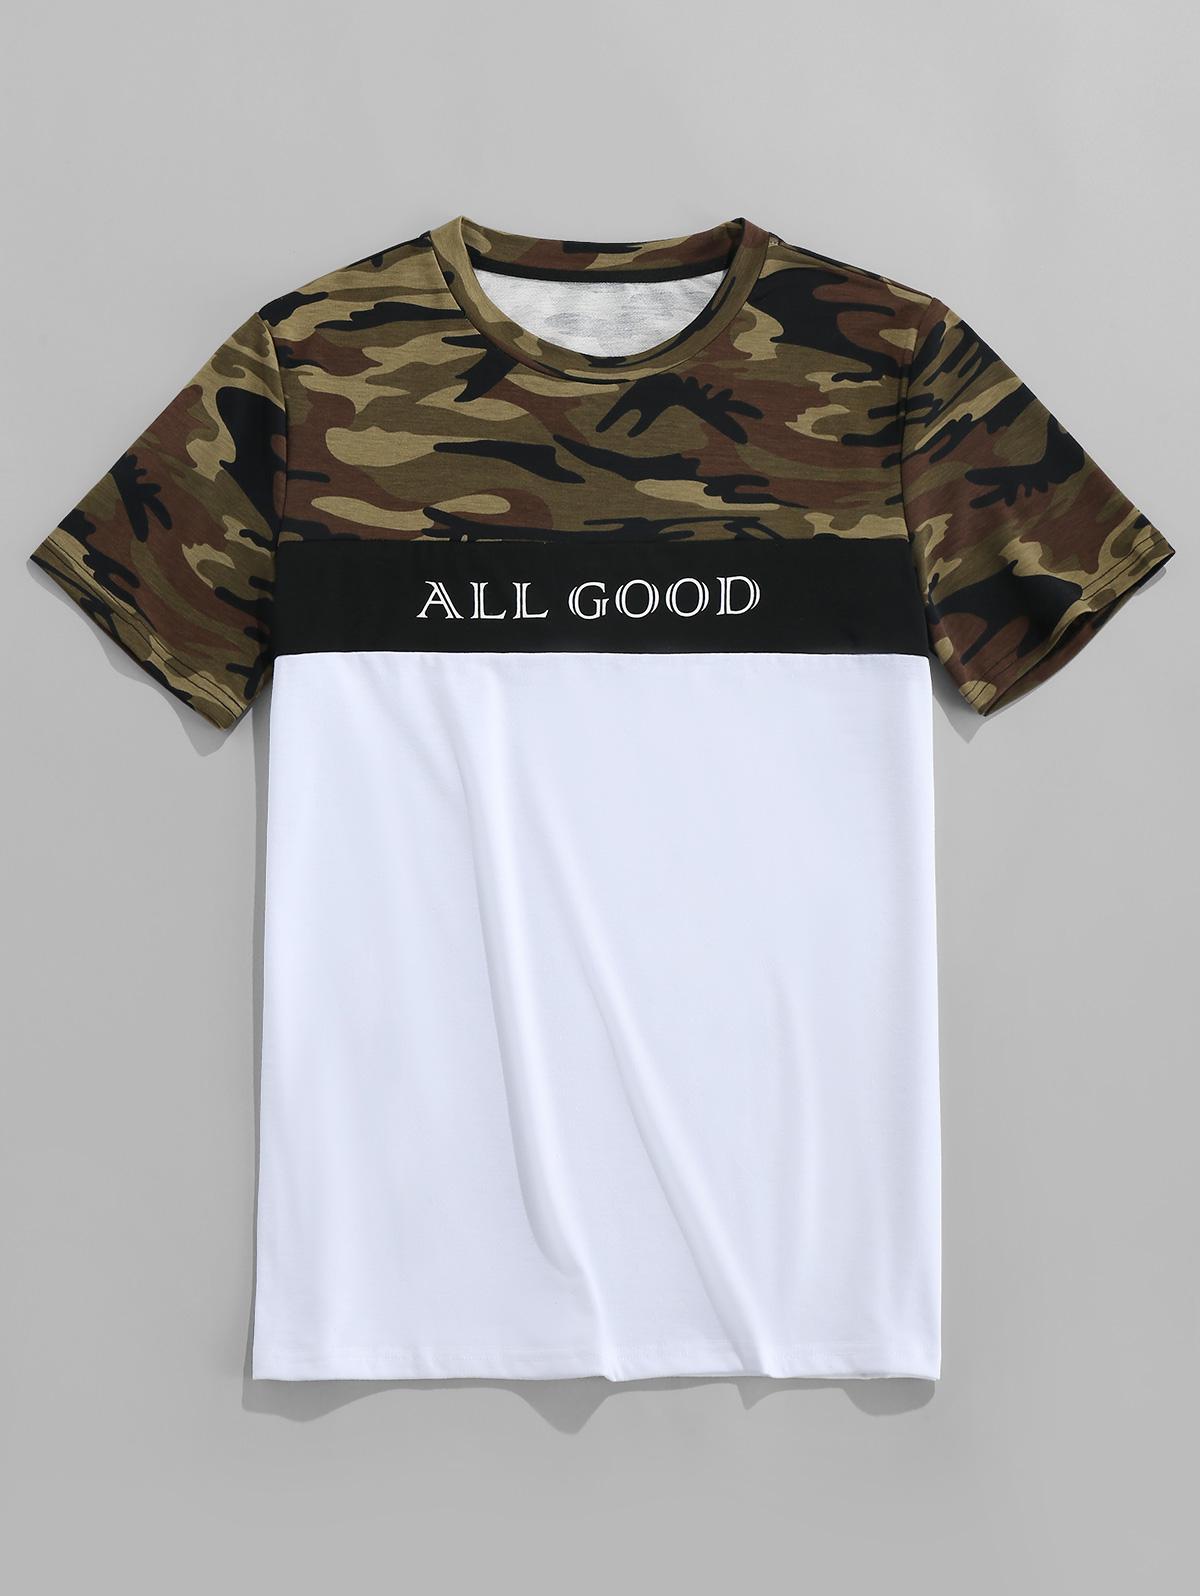 Zaful coupon: ZAFUL Letter Camo Print Short Sleeves T-shirt